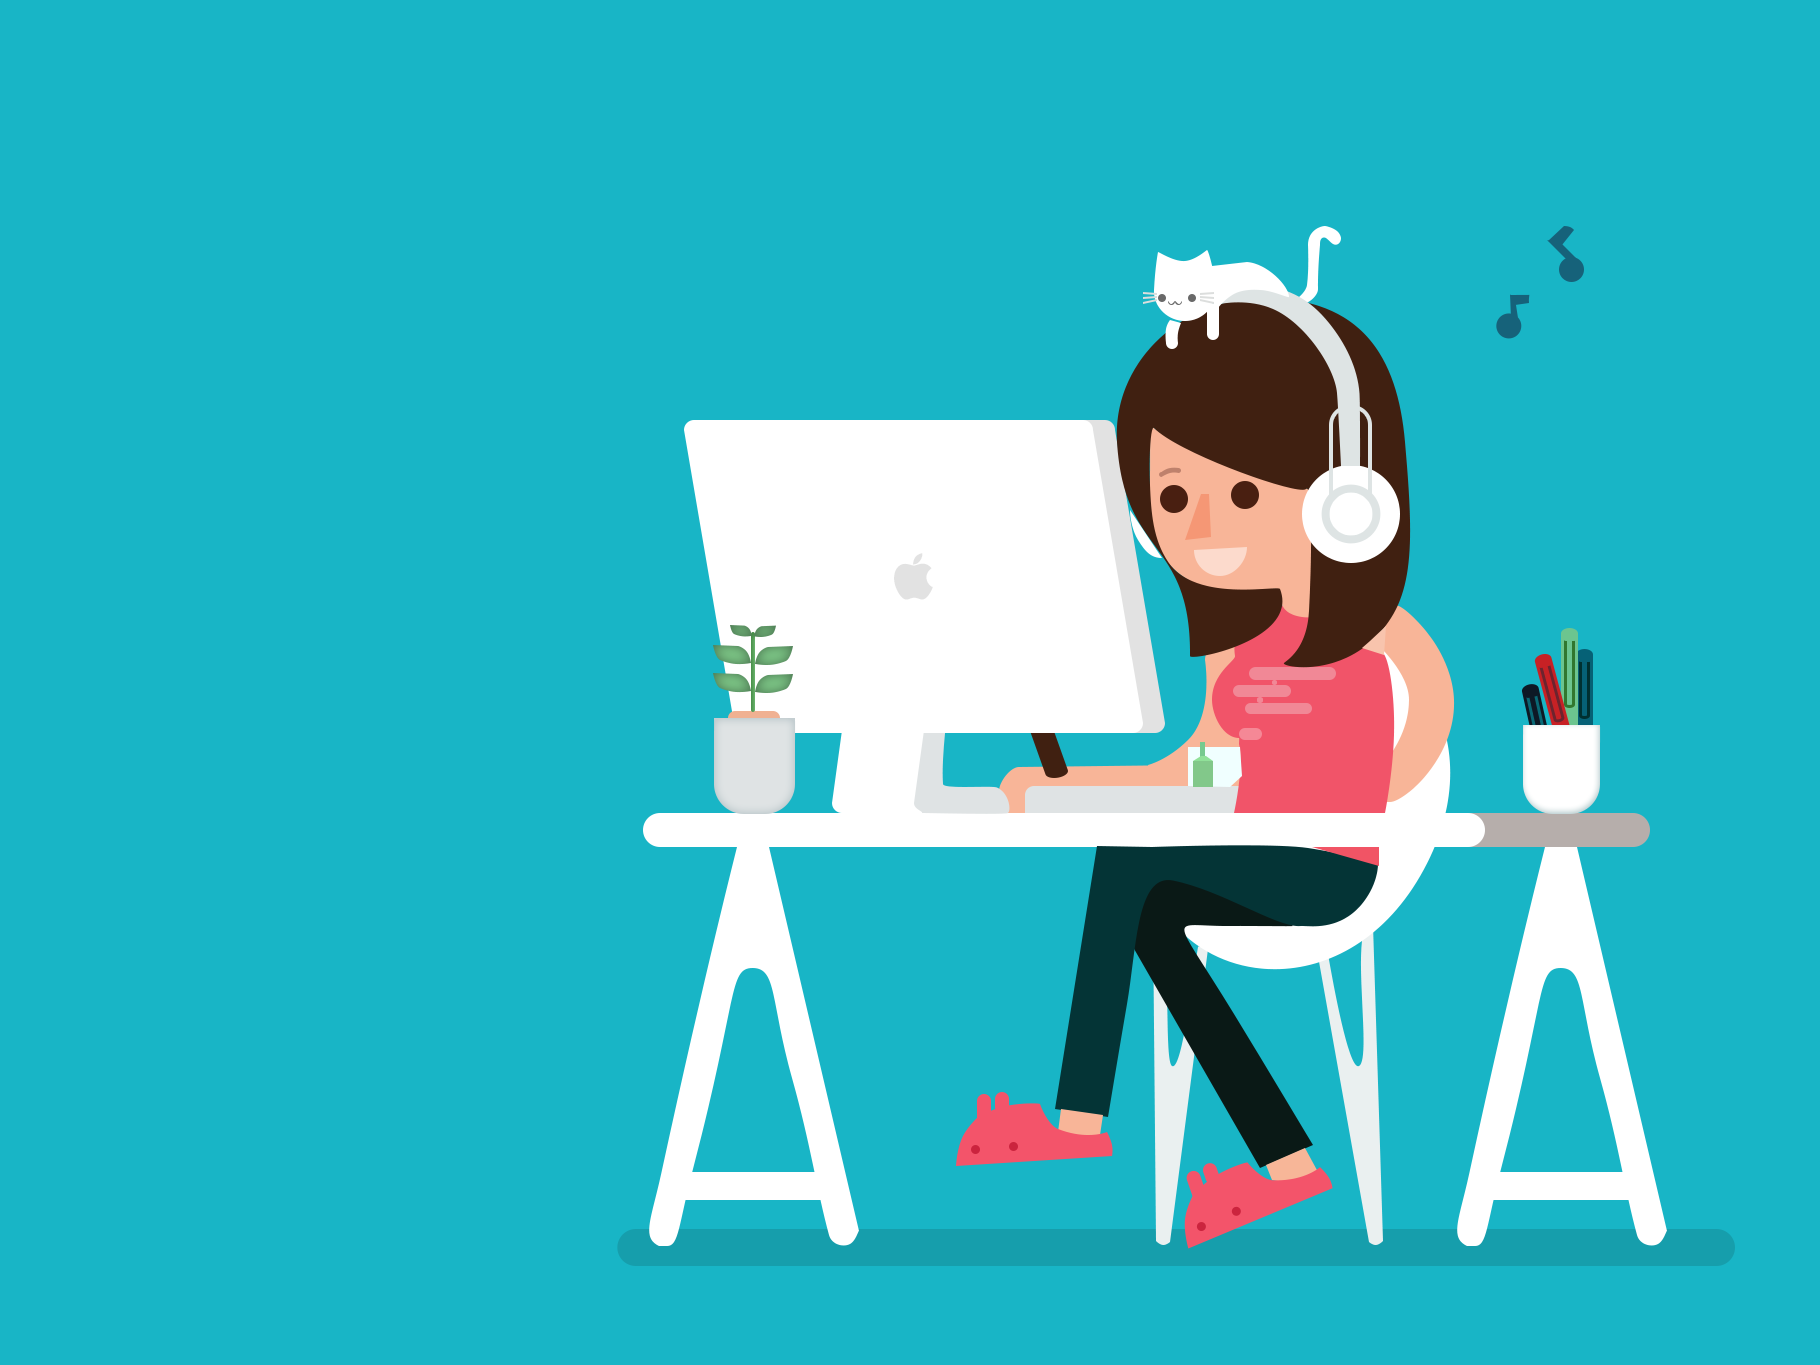 In design freelance работа вакансии сметчиком удаленная работа